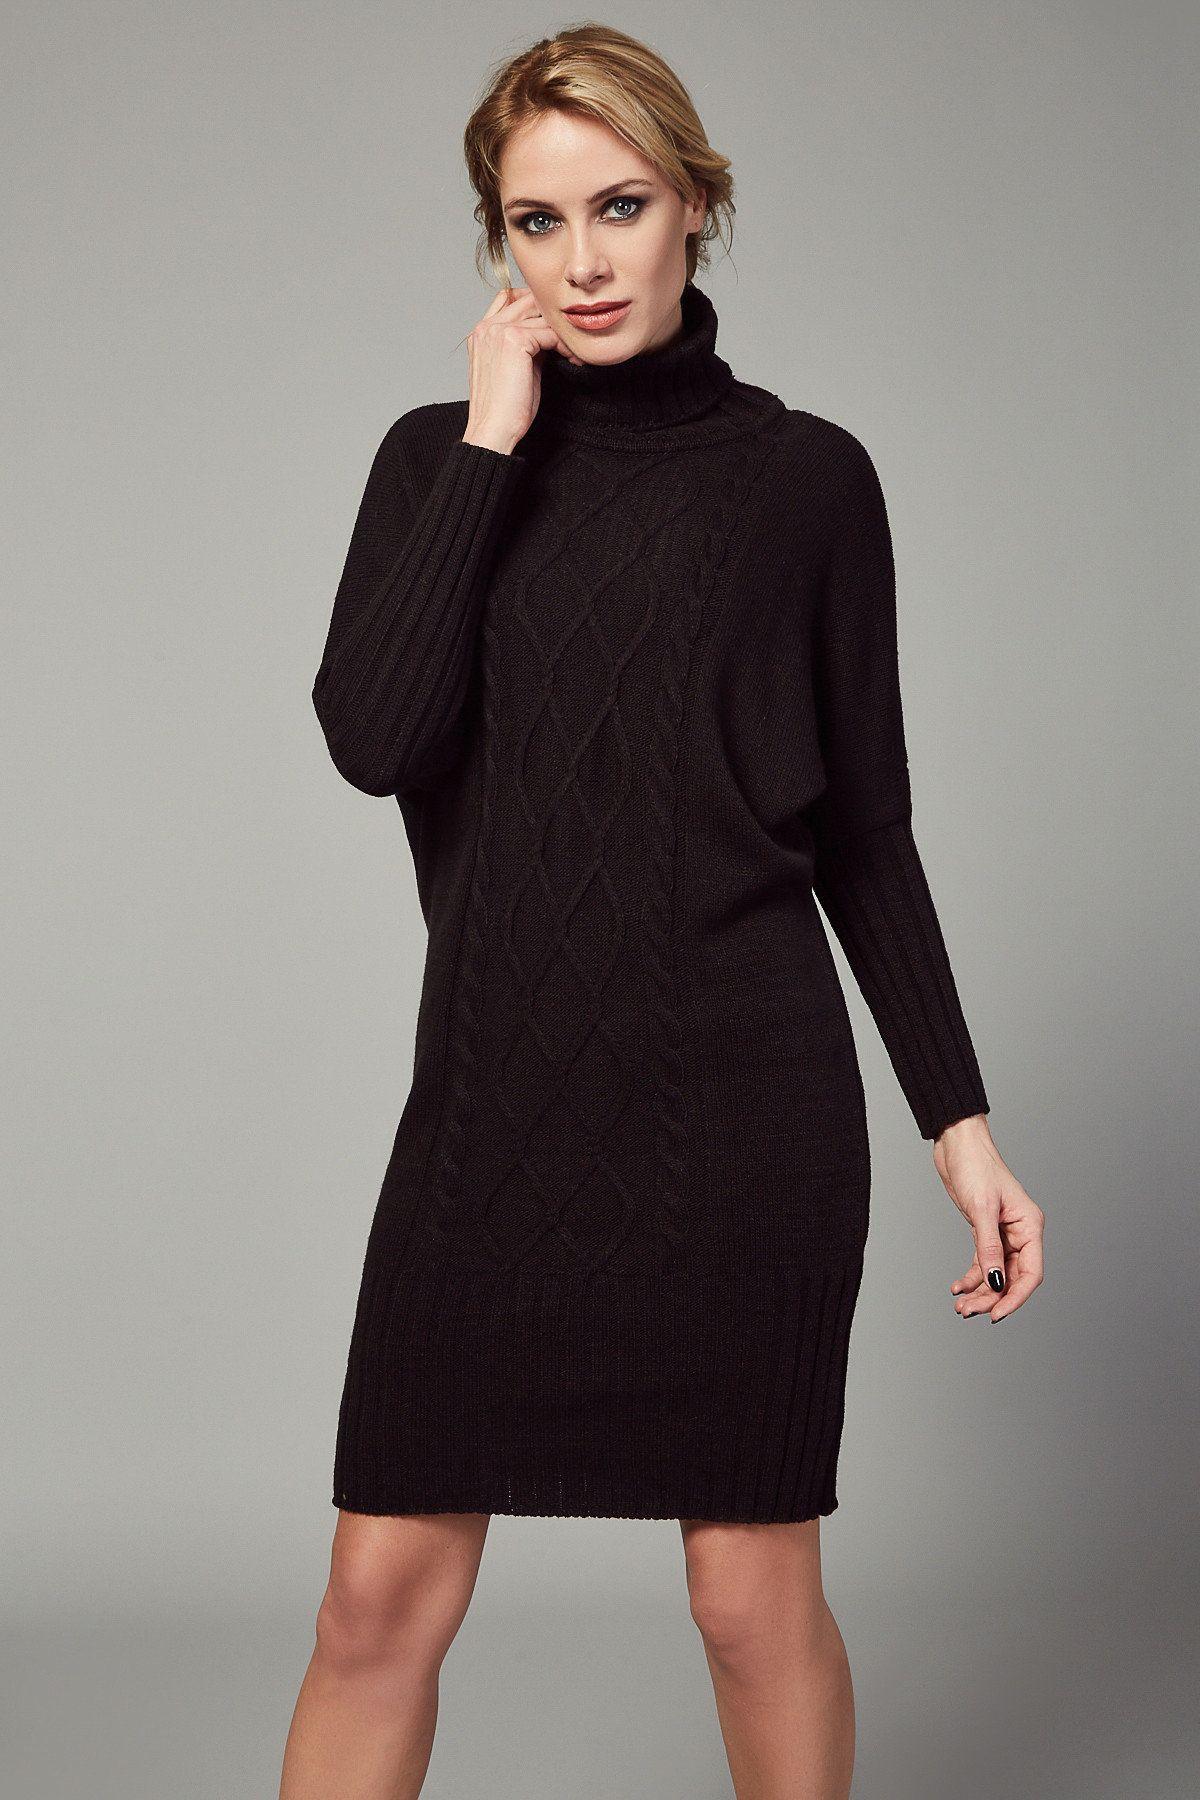 Kadin Siyah Balikci Yaka Balon Kollu Triko Elbise Happiness Ist Trendyol Triko Siyah Balikci Yaka Moda Stilleri